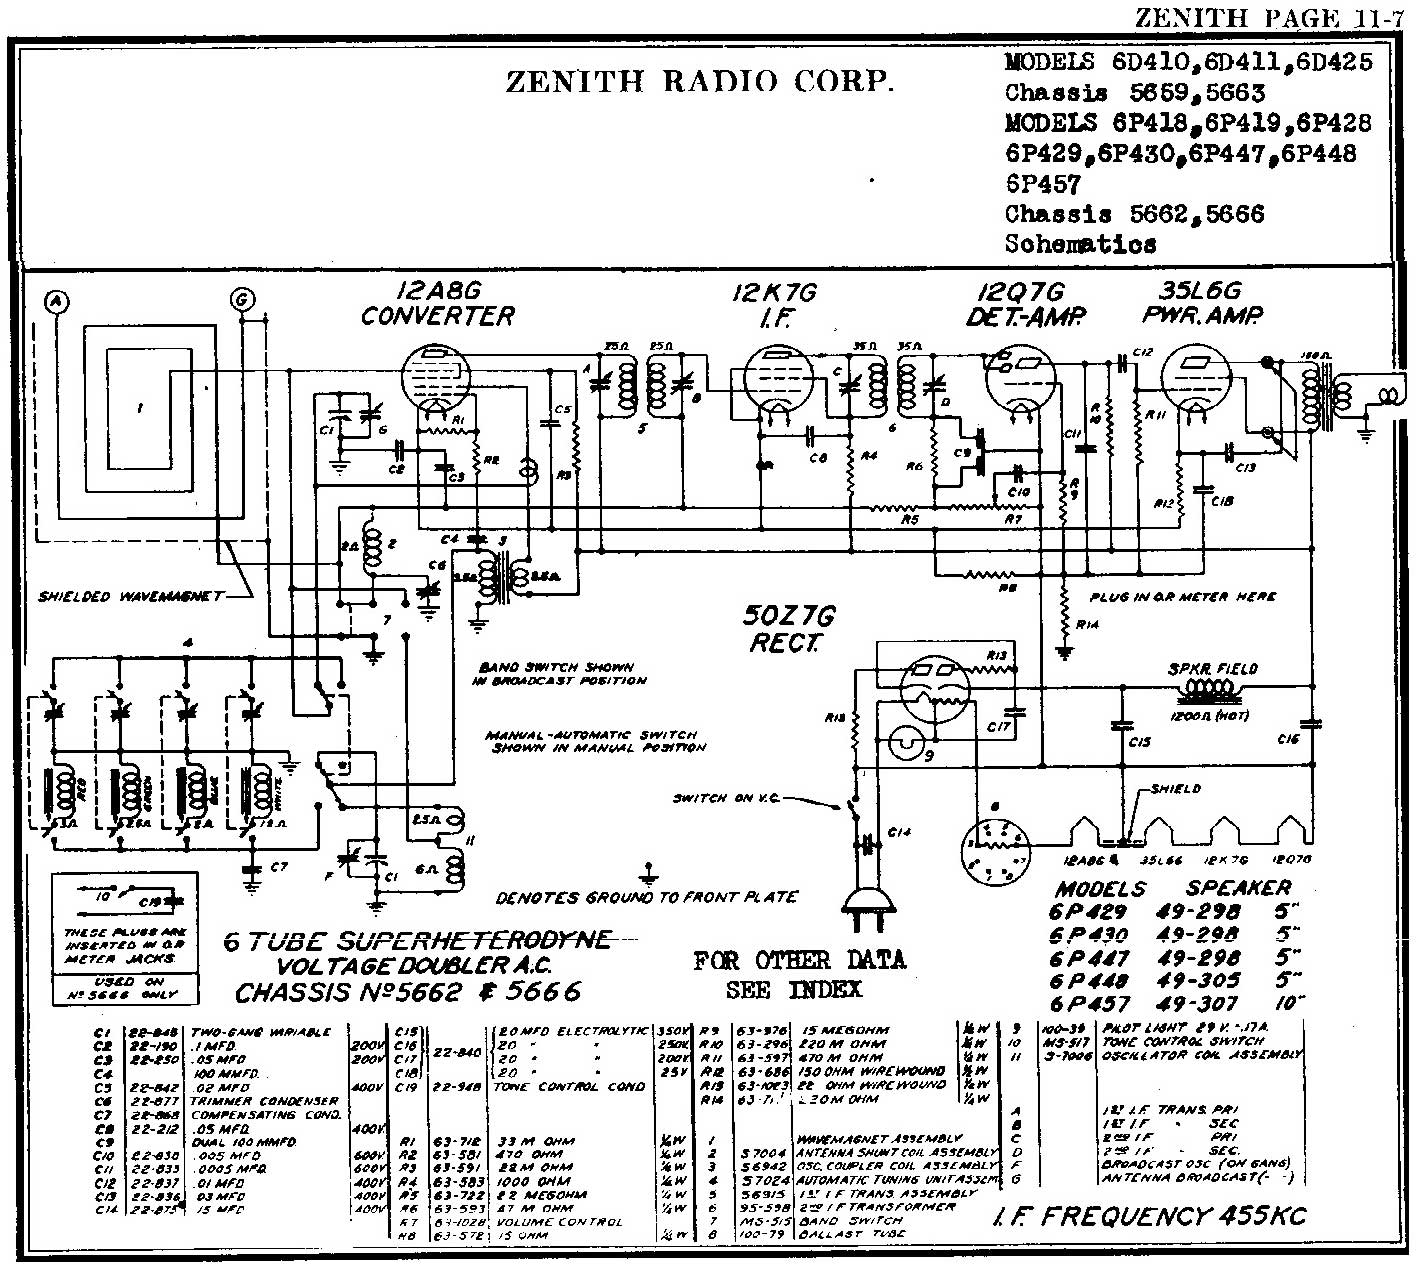 james u0026 39 s zenith 6p448 radio cart repair